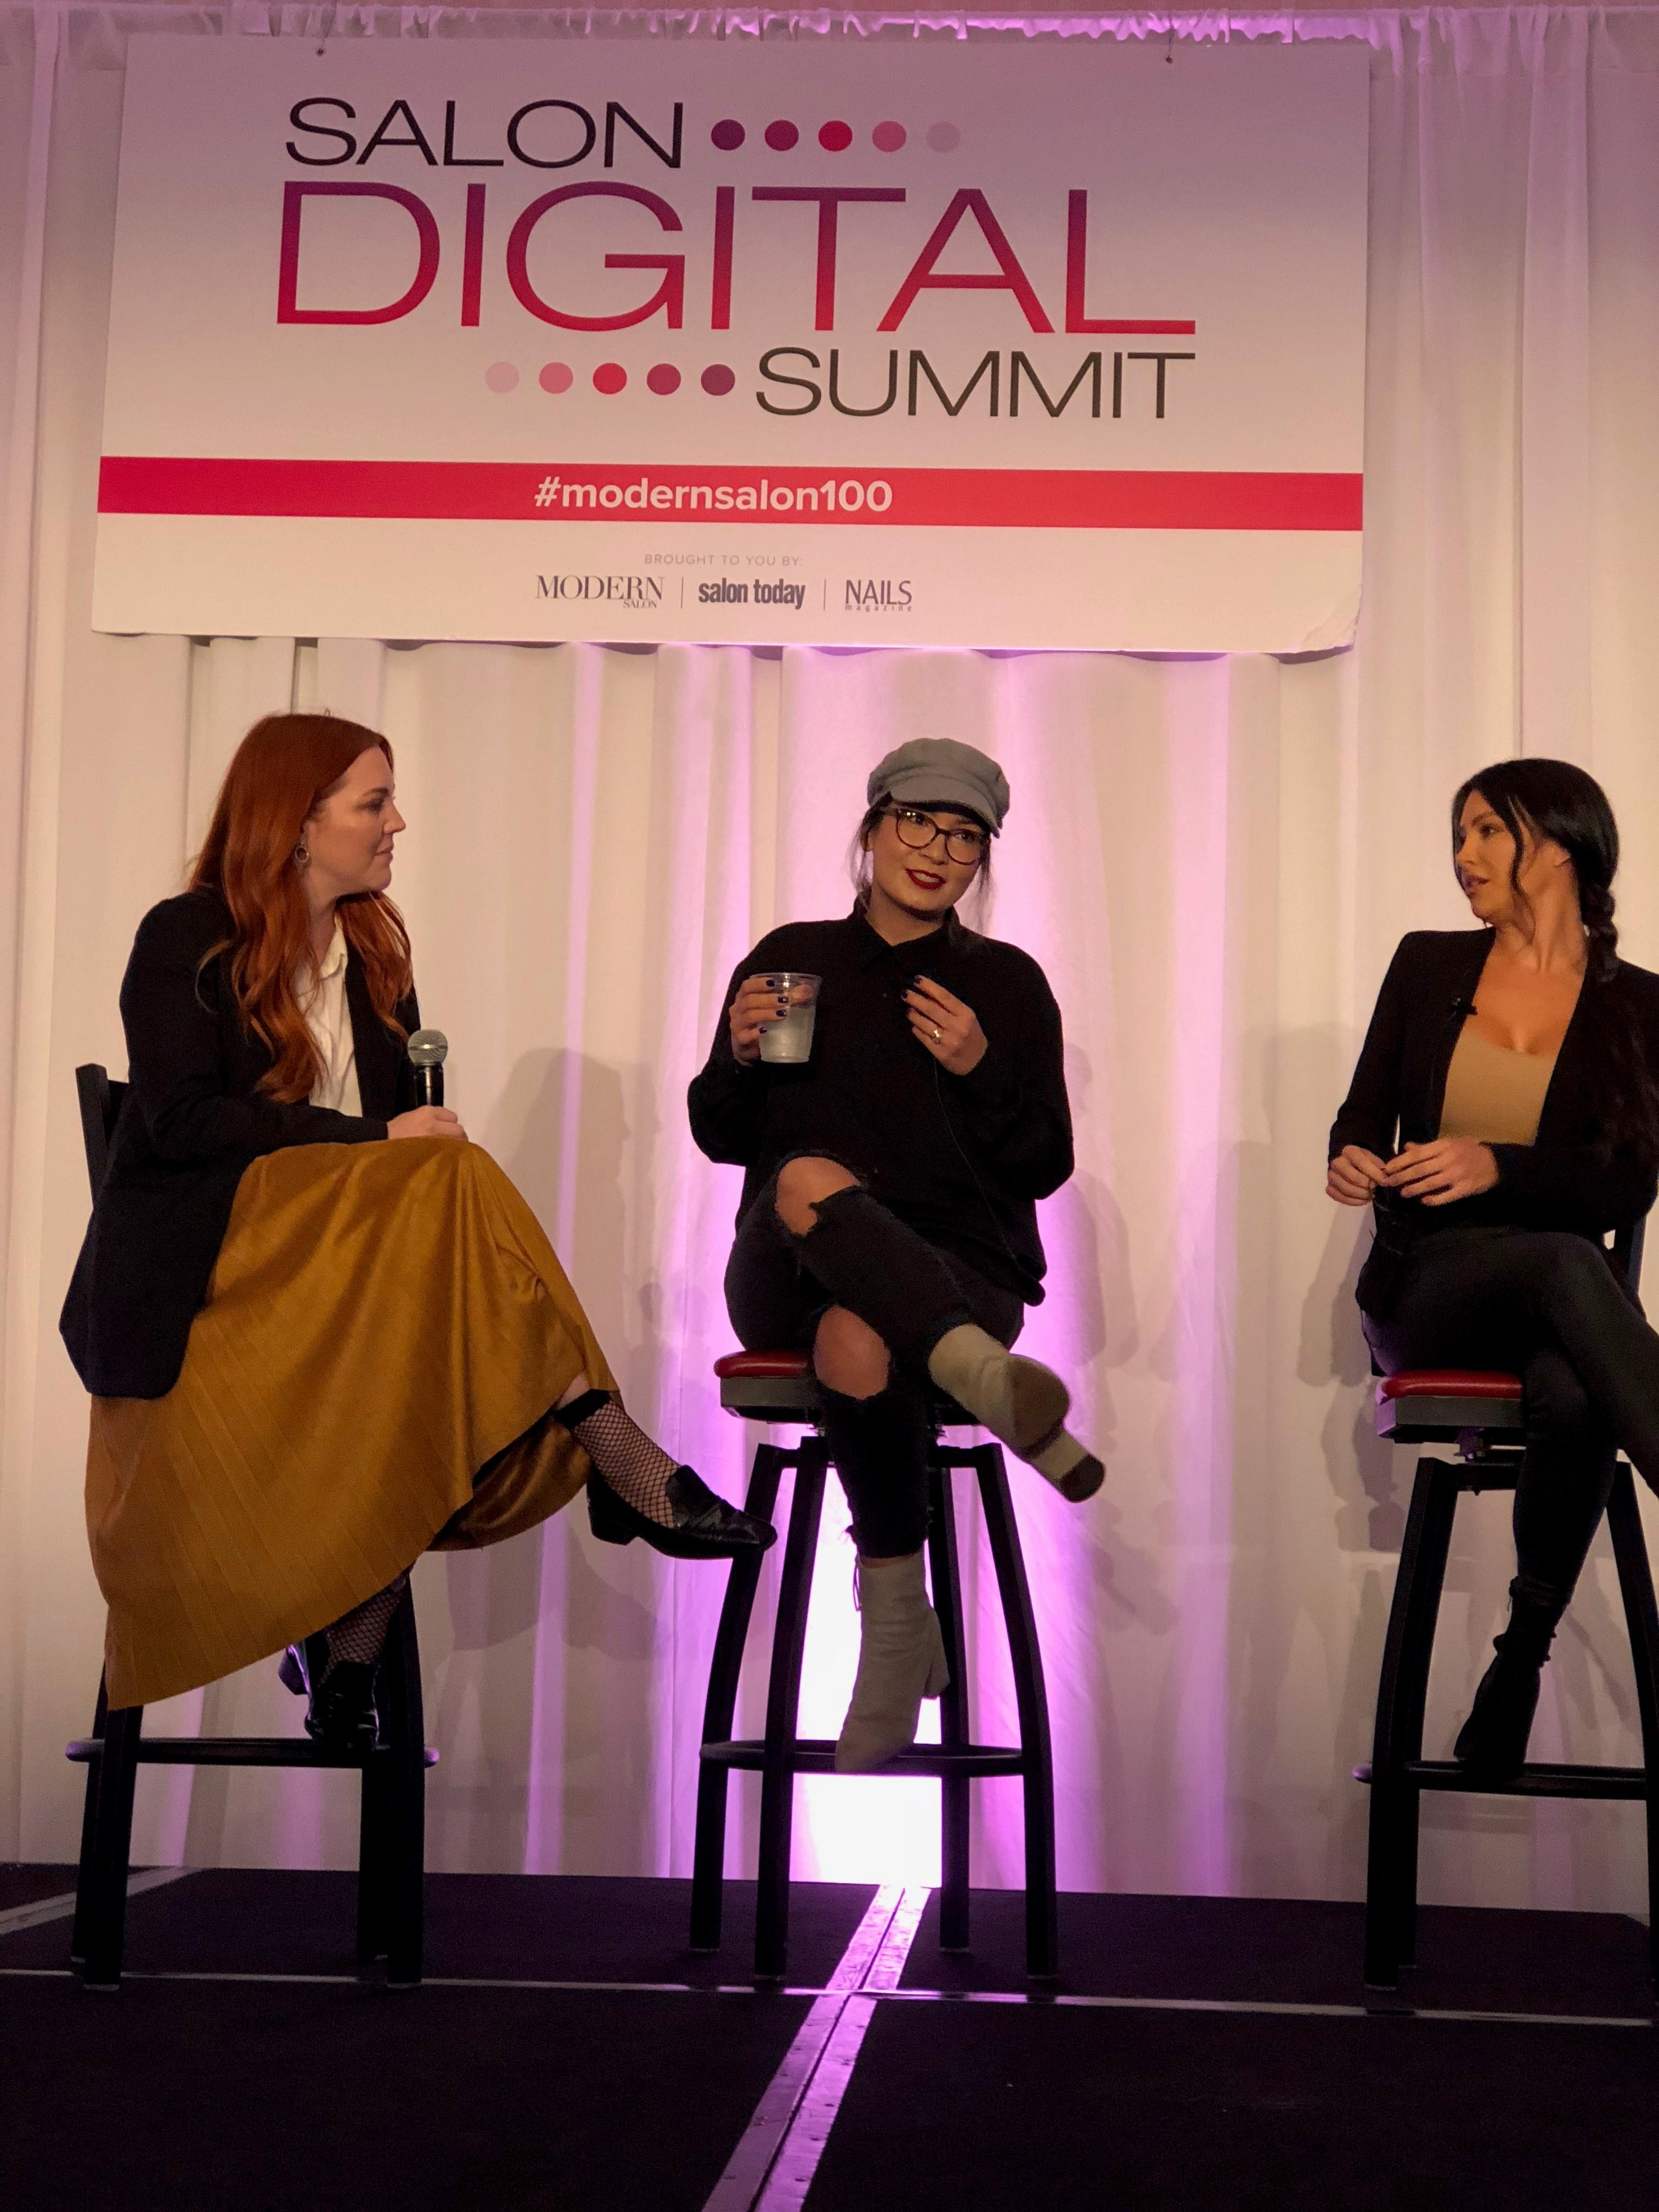 Salon Digital Summit: Social Media Success, Step-by-Step, with Mane Addicts